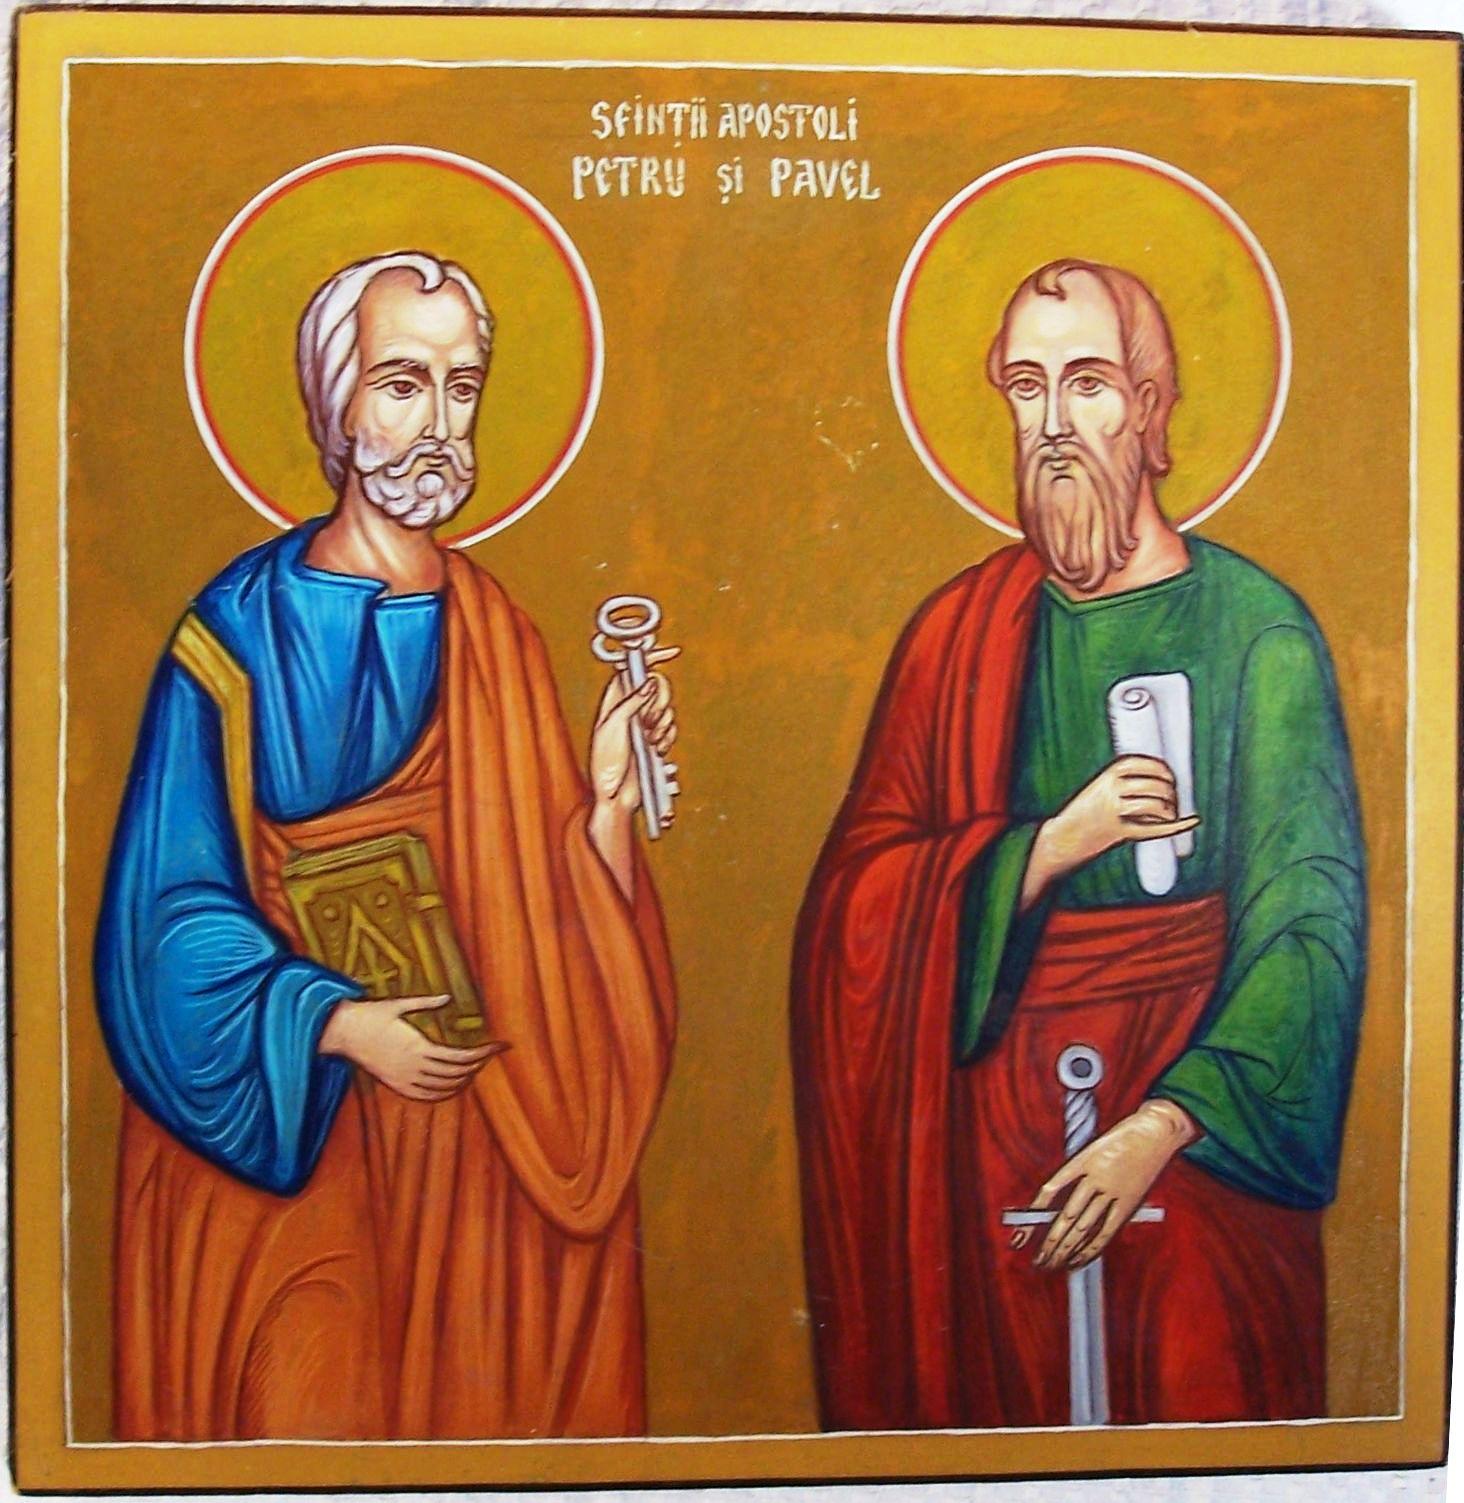 Photographis: Petru si Pavel - Feast of Saints Peter and Paul  |Sf. Petru Si Pavel